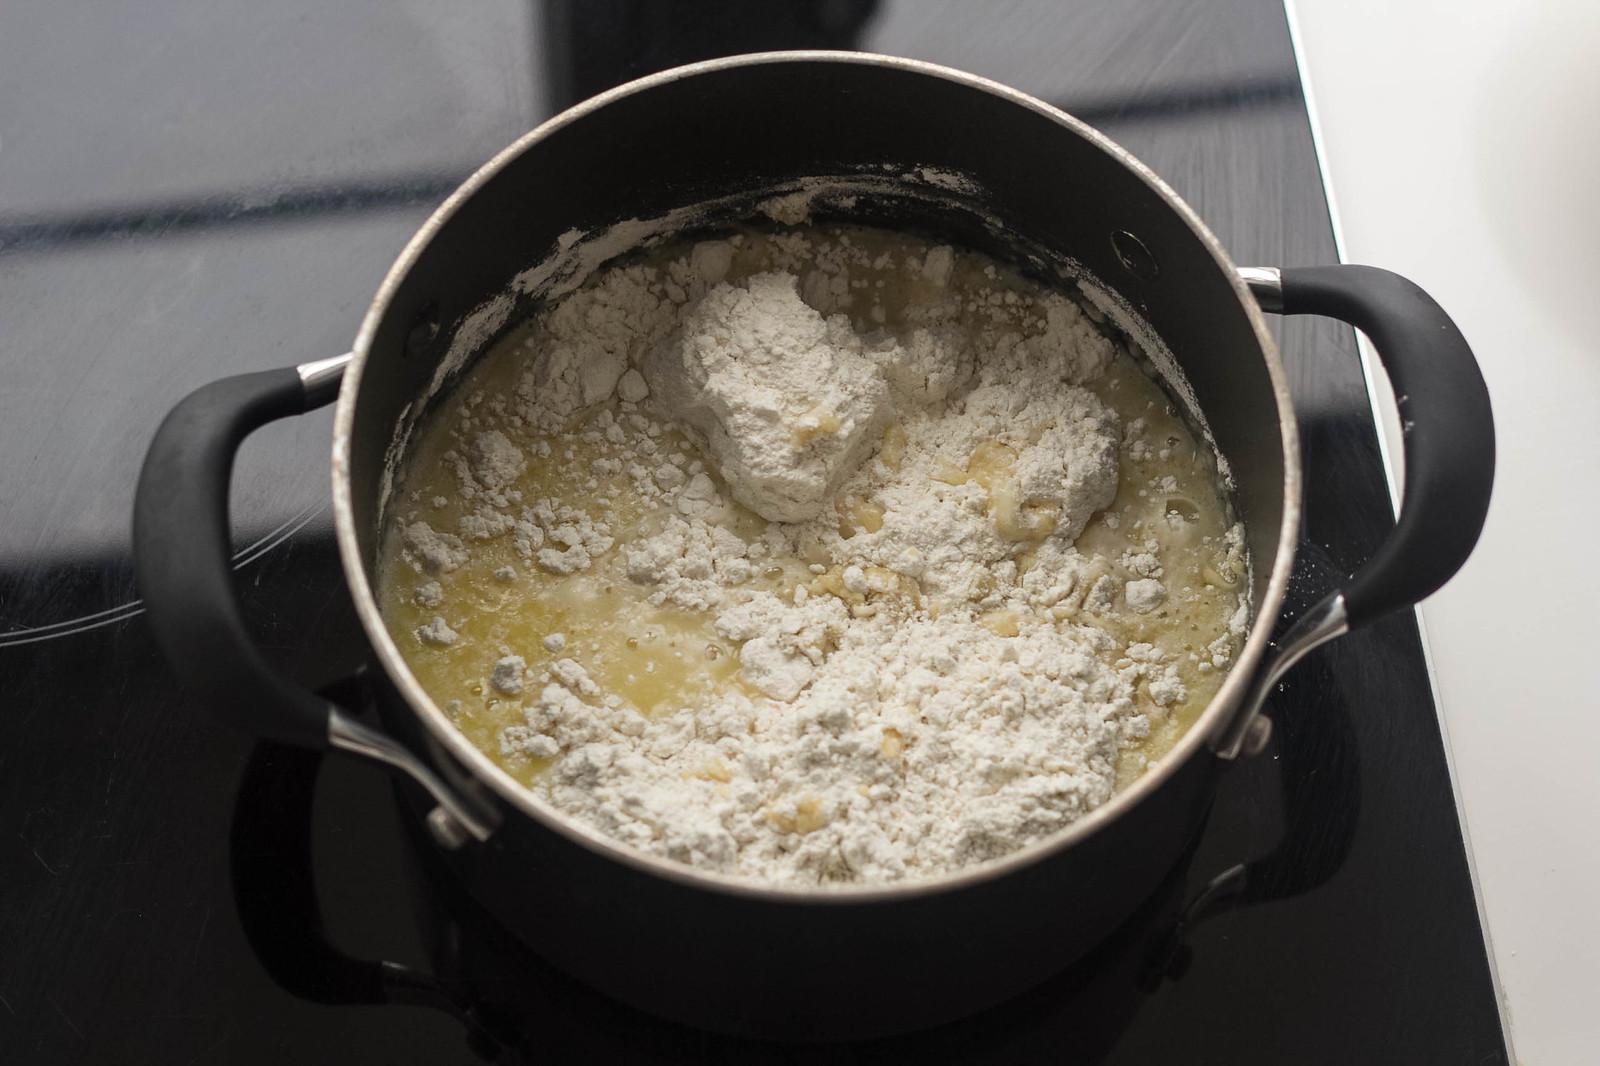 Step-by-step instructions for homemade Danish Borthday Cake (Kagemand)